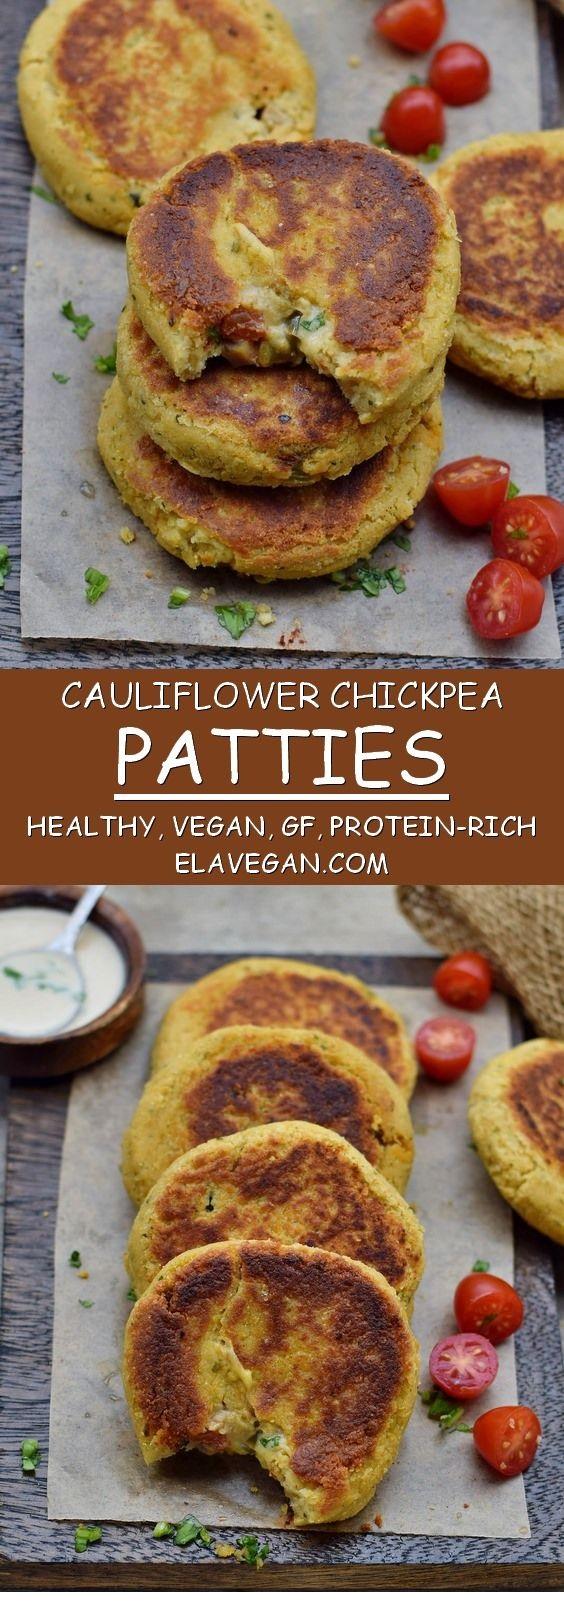 GLUTEN FREE RECIPES   Cauliflower patties recipe